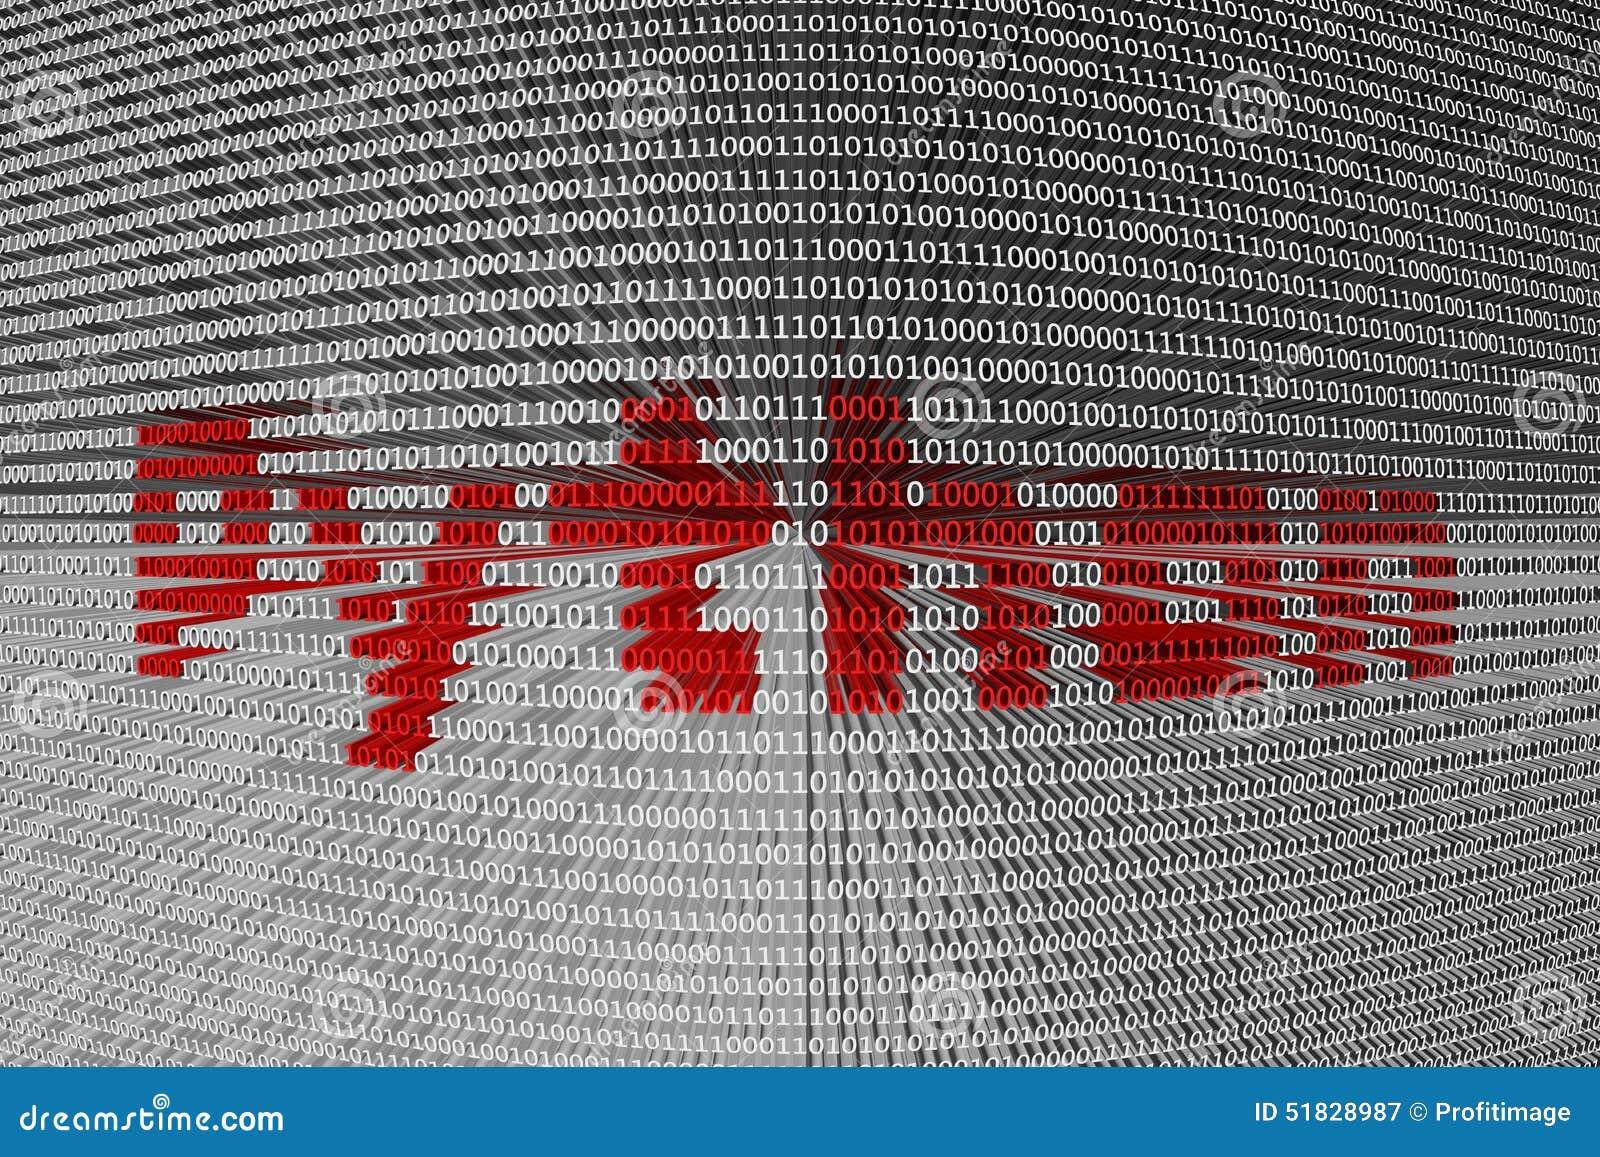 Binary Code Is A High Level Programming Language Python Stock